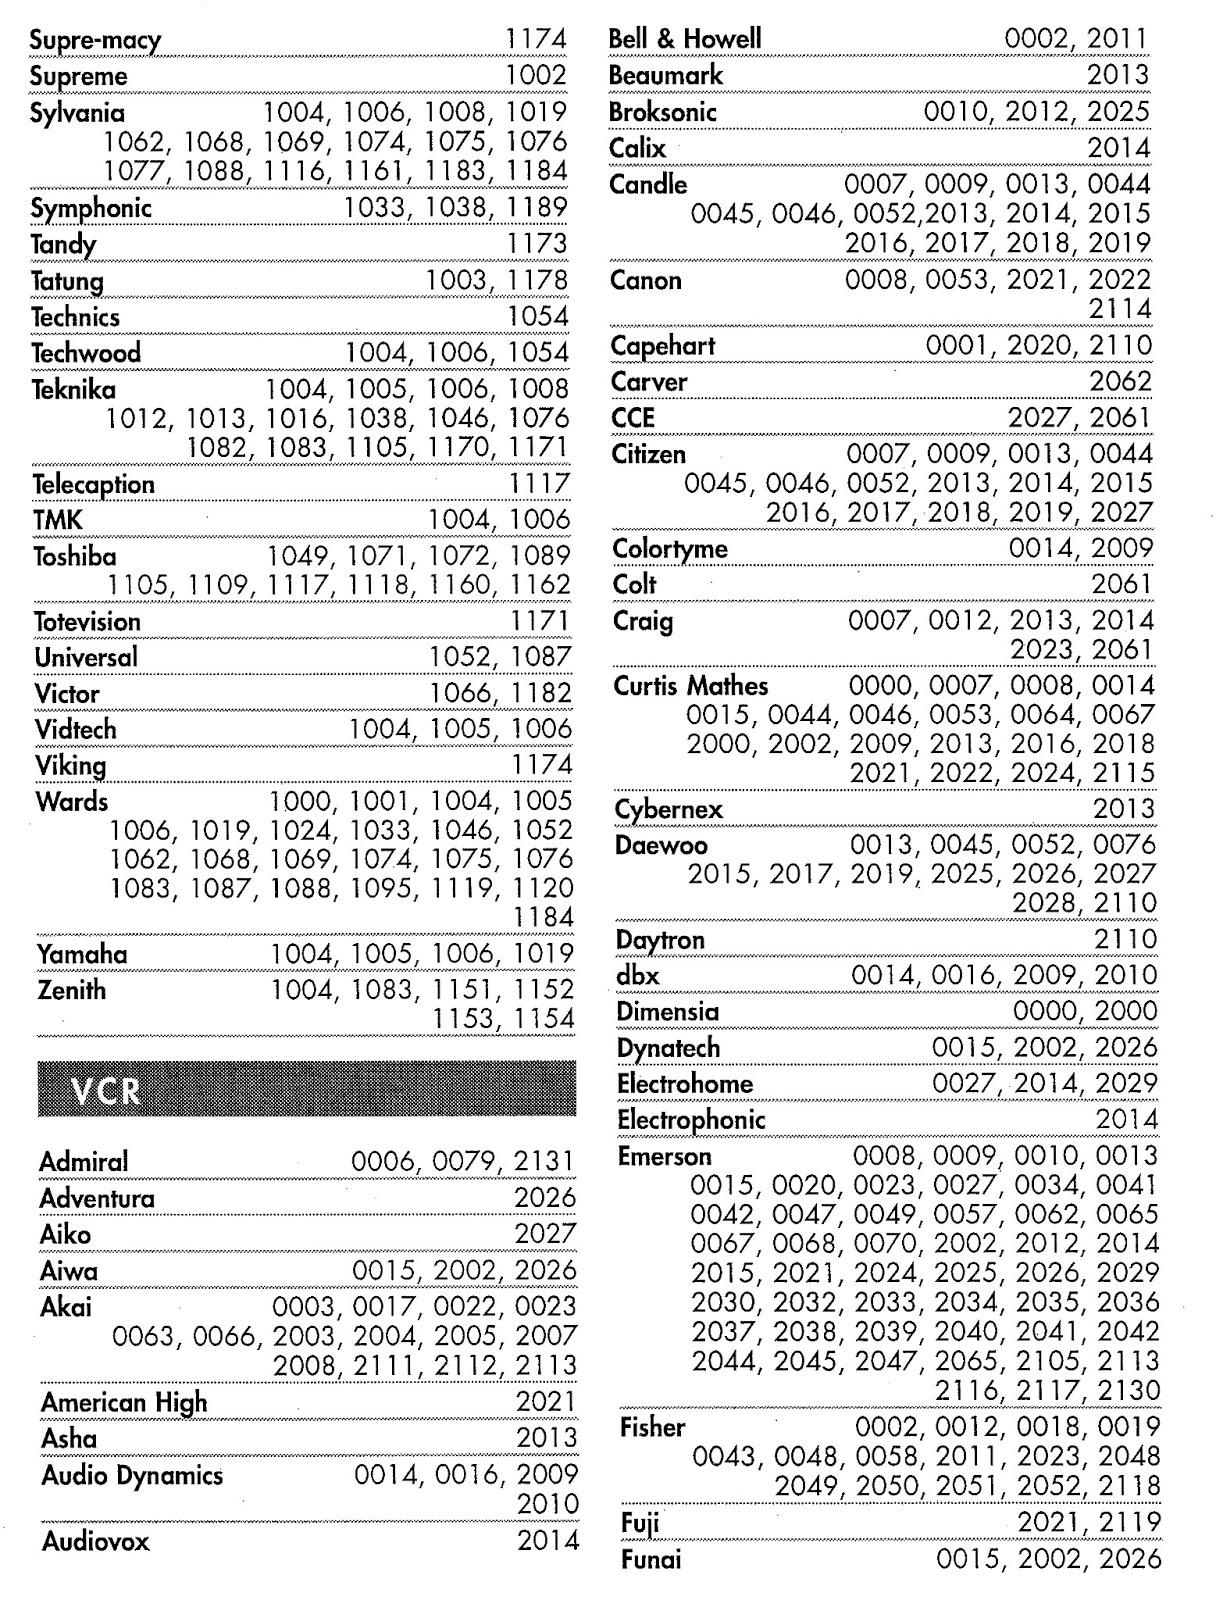 rca crk76wa1 - remote control - setup code list